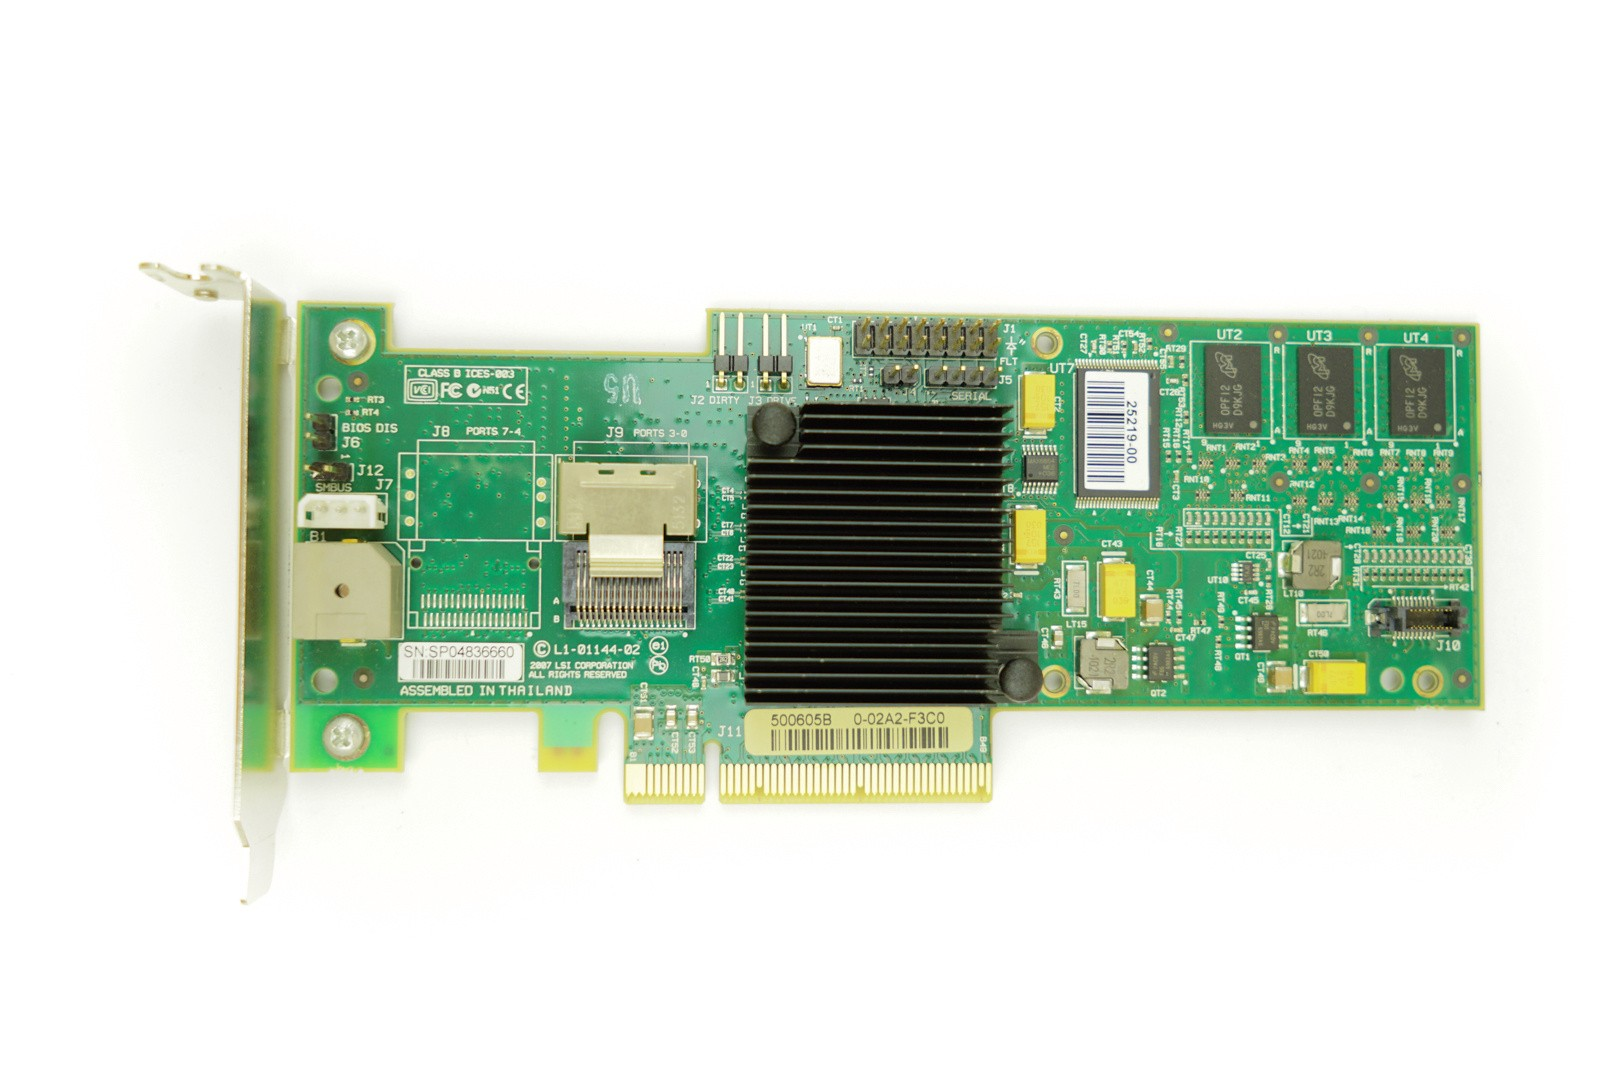 LSI SAS8704EM2 128MB - LP PCIe-x8 RAID Controller